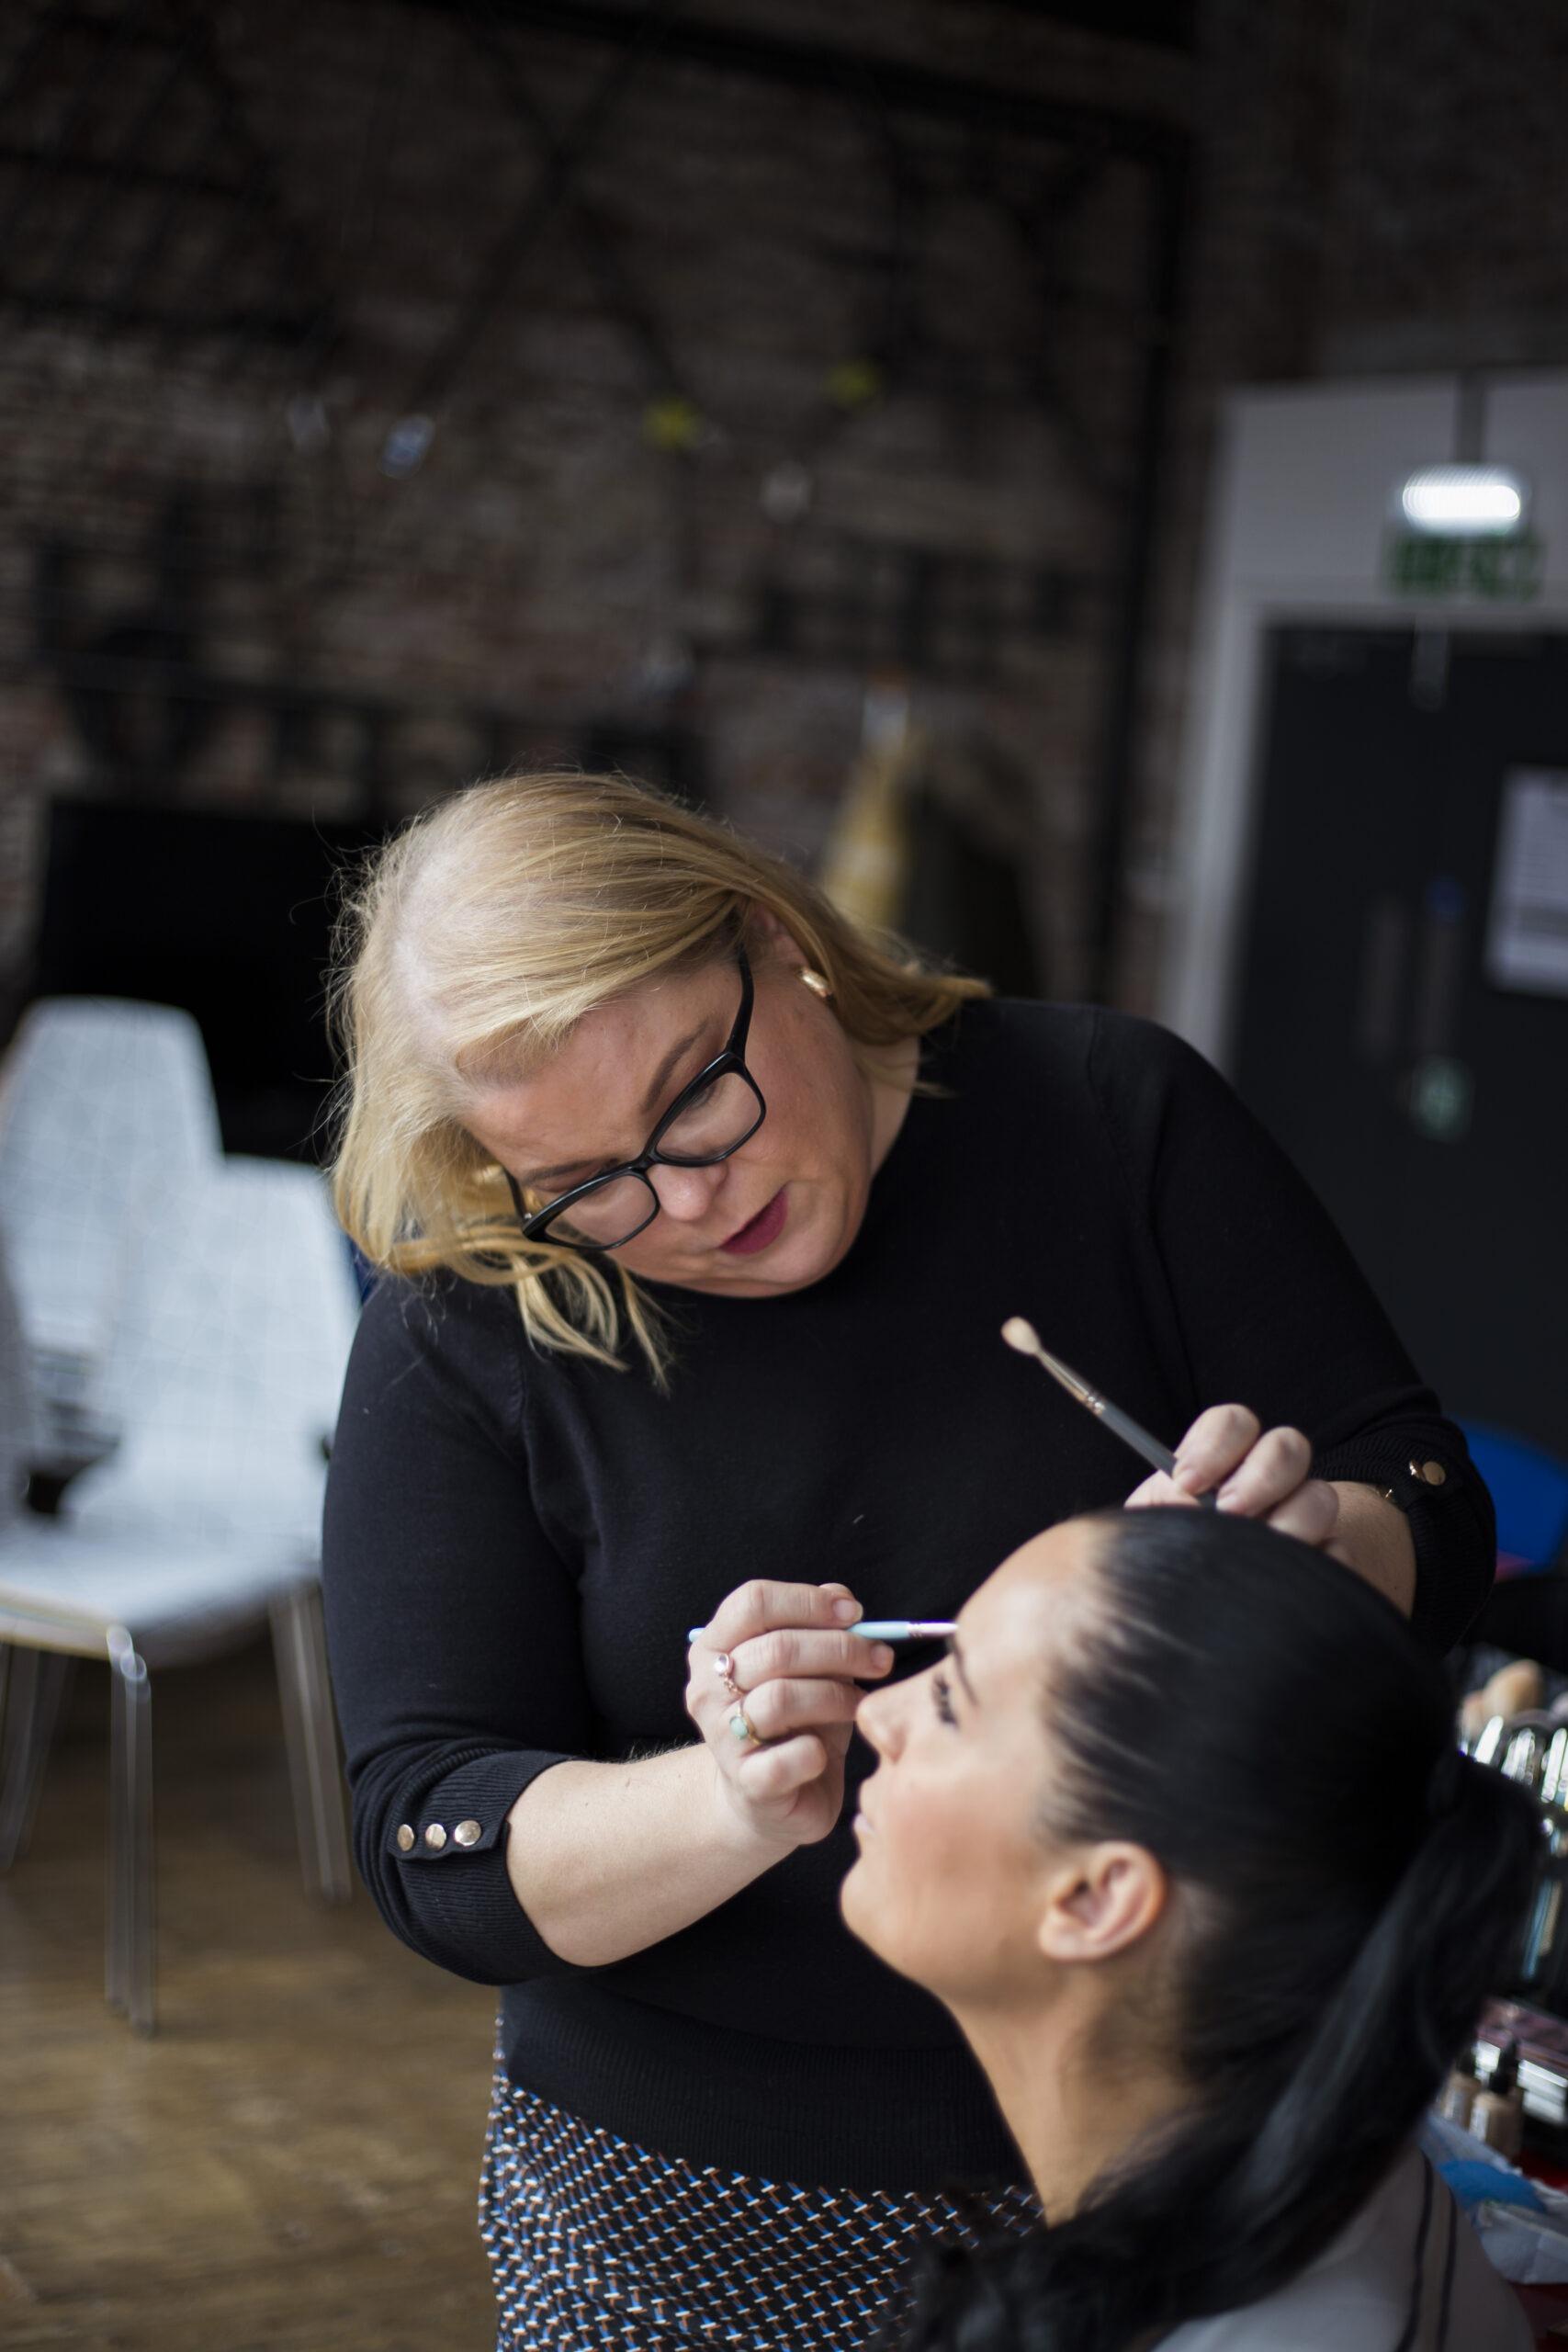 Glamorama Makeup mobile makeup artist working in Liverpool